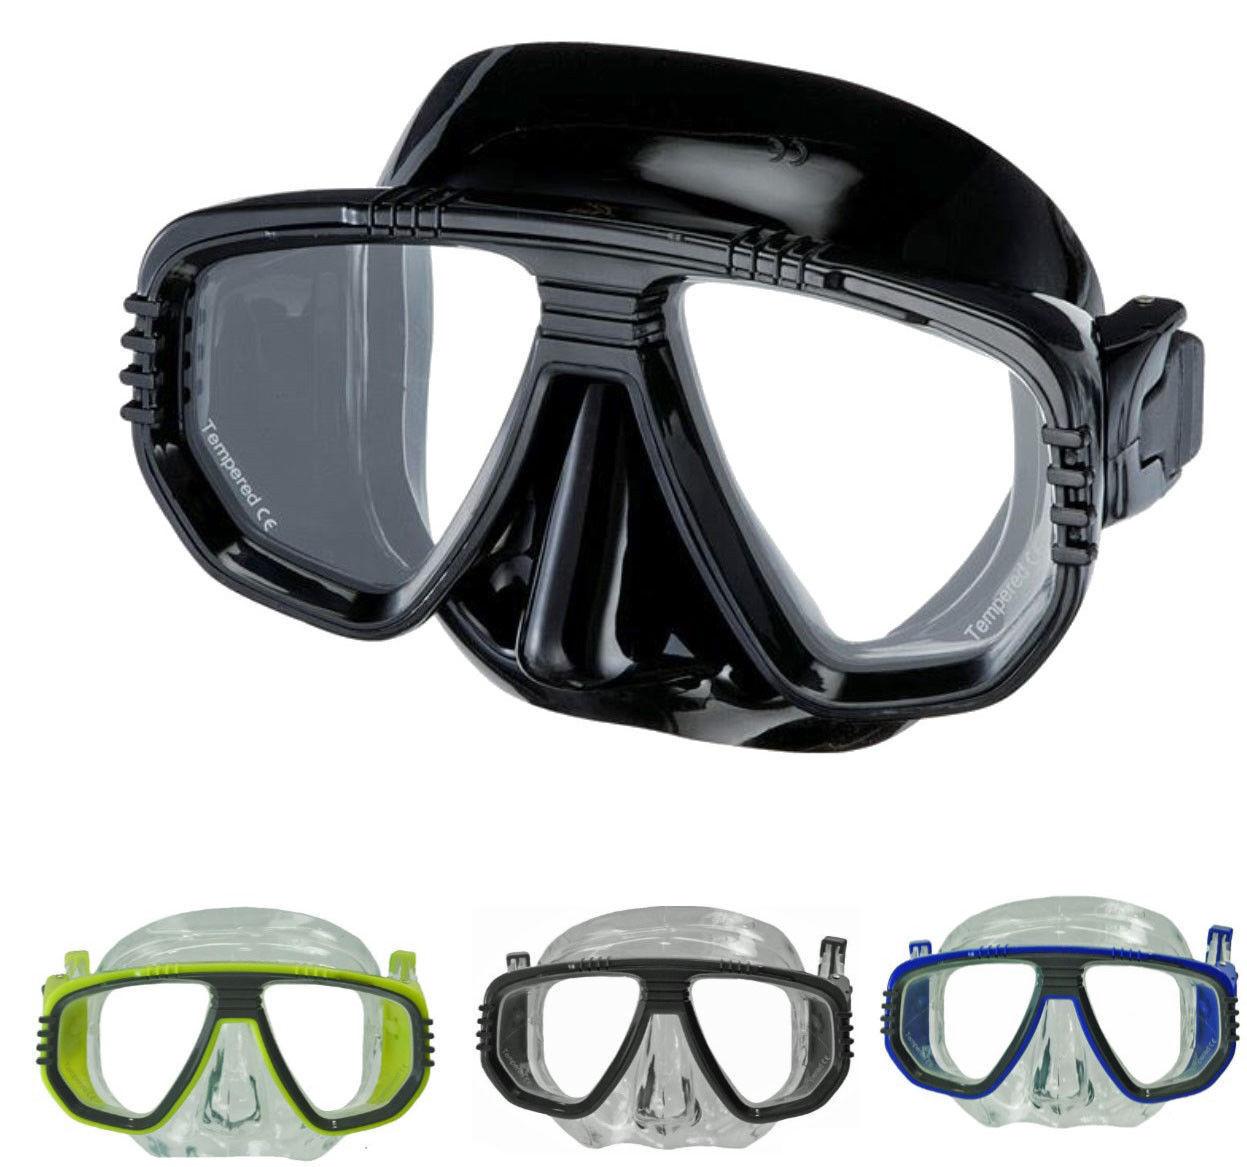 PRESCRIPTION Scuba Dive Snorkel Spearfishing MASK + RX SIGHT CORRECTIVE Lens